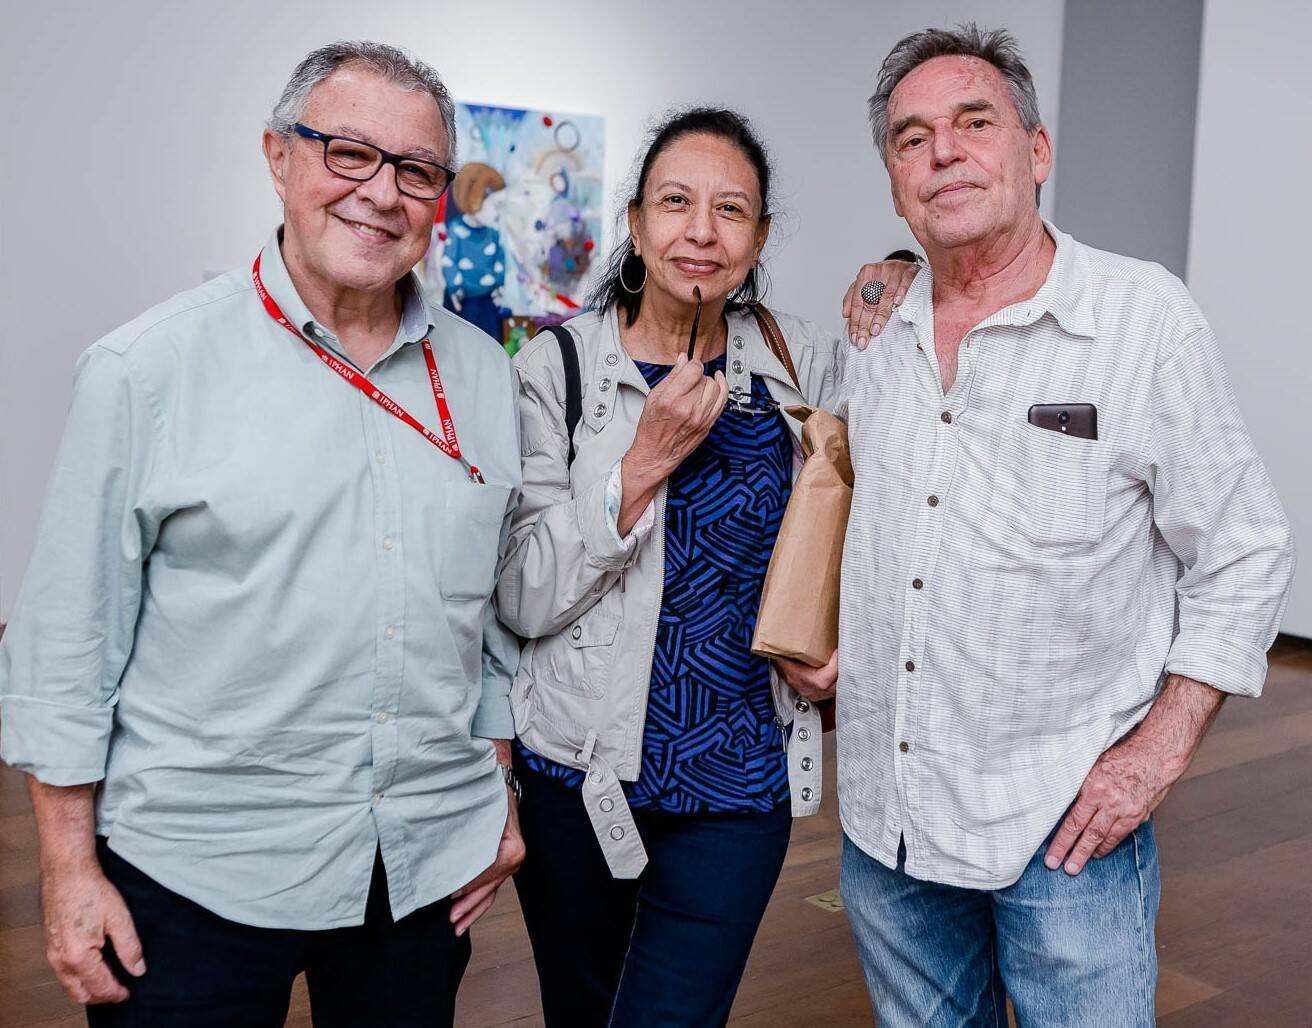 Altair Ribeiro, Marlene Custódio e Chico Chaves  /Foto: Bruno Ryfer